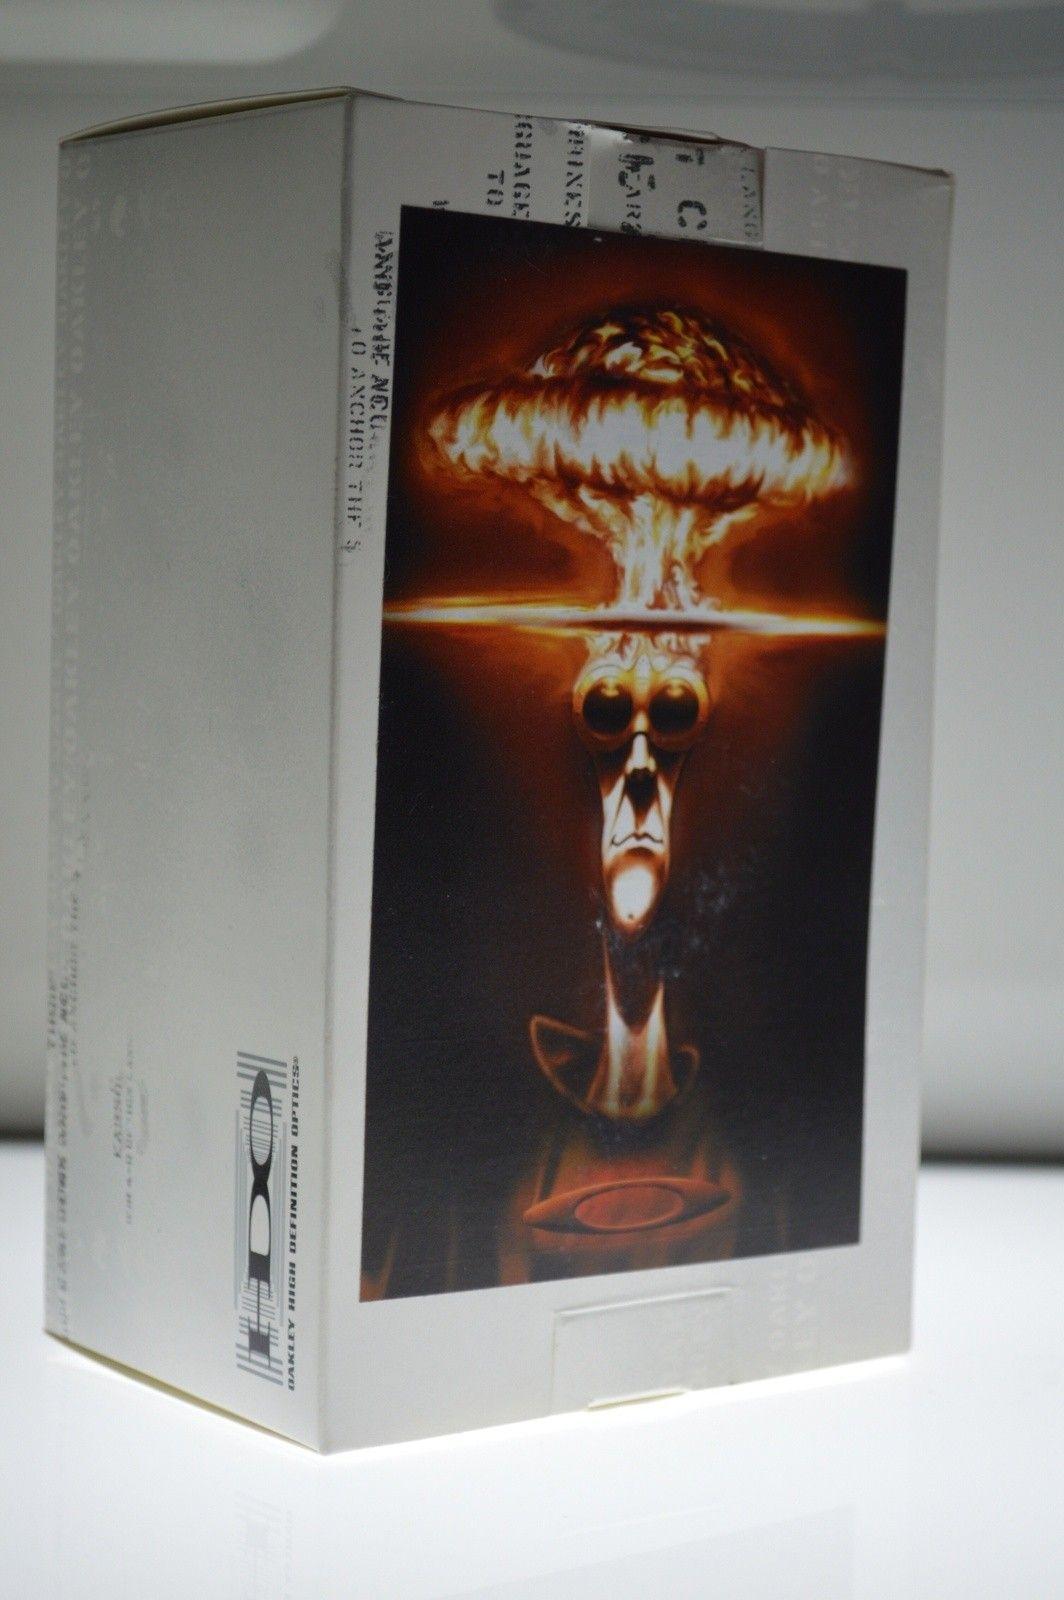 My BNIB Complete Medusa Vs Xmetals - image-jpg.152191.jpg